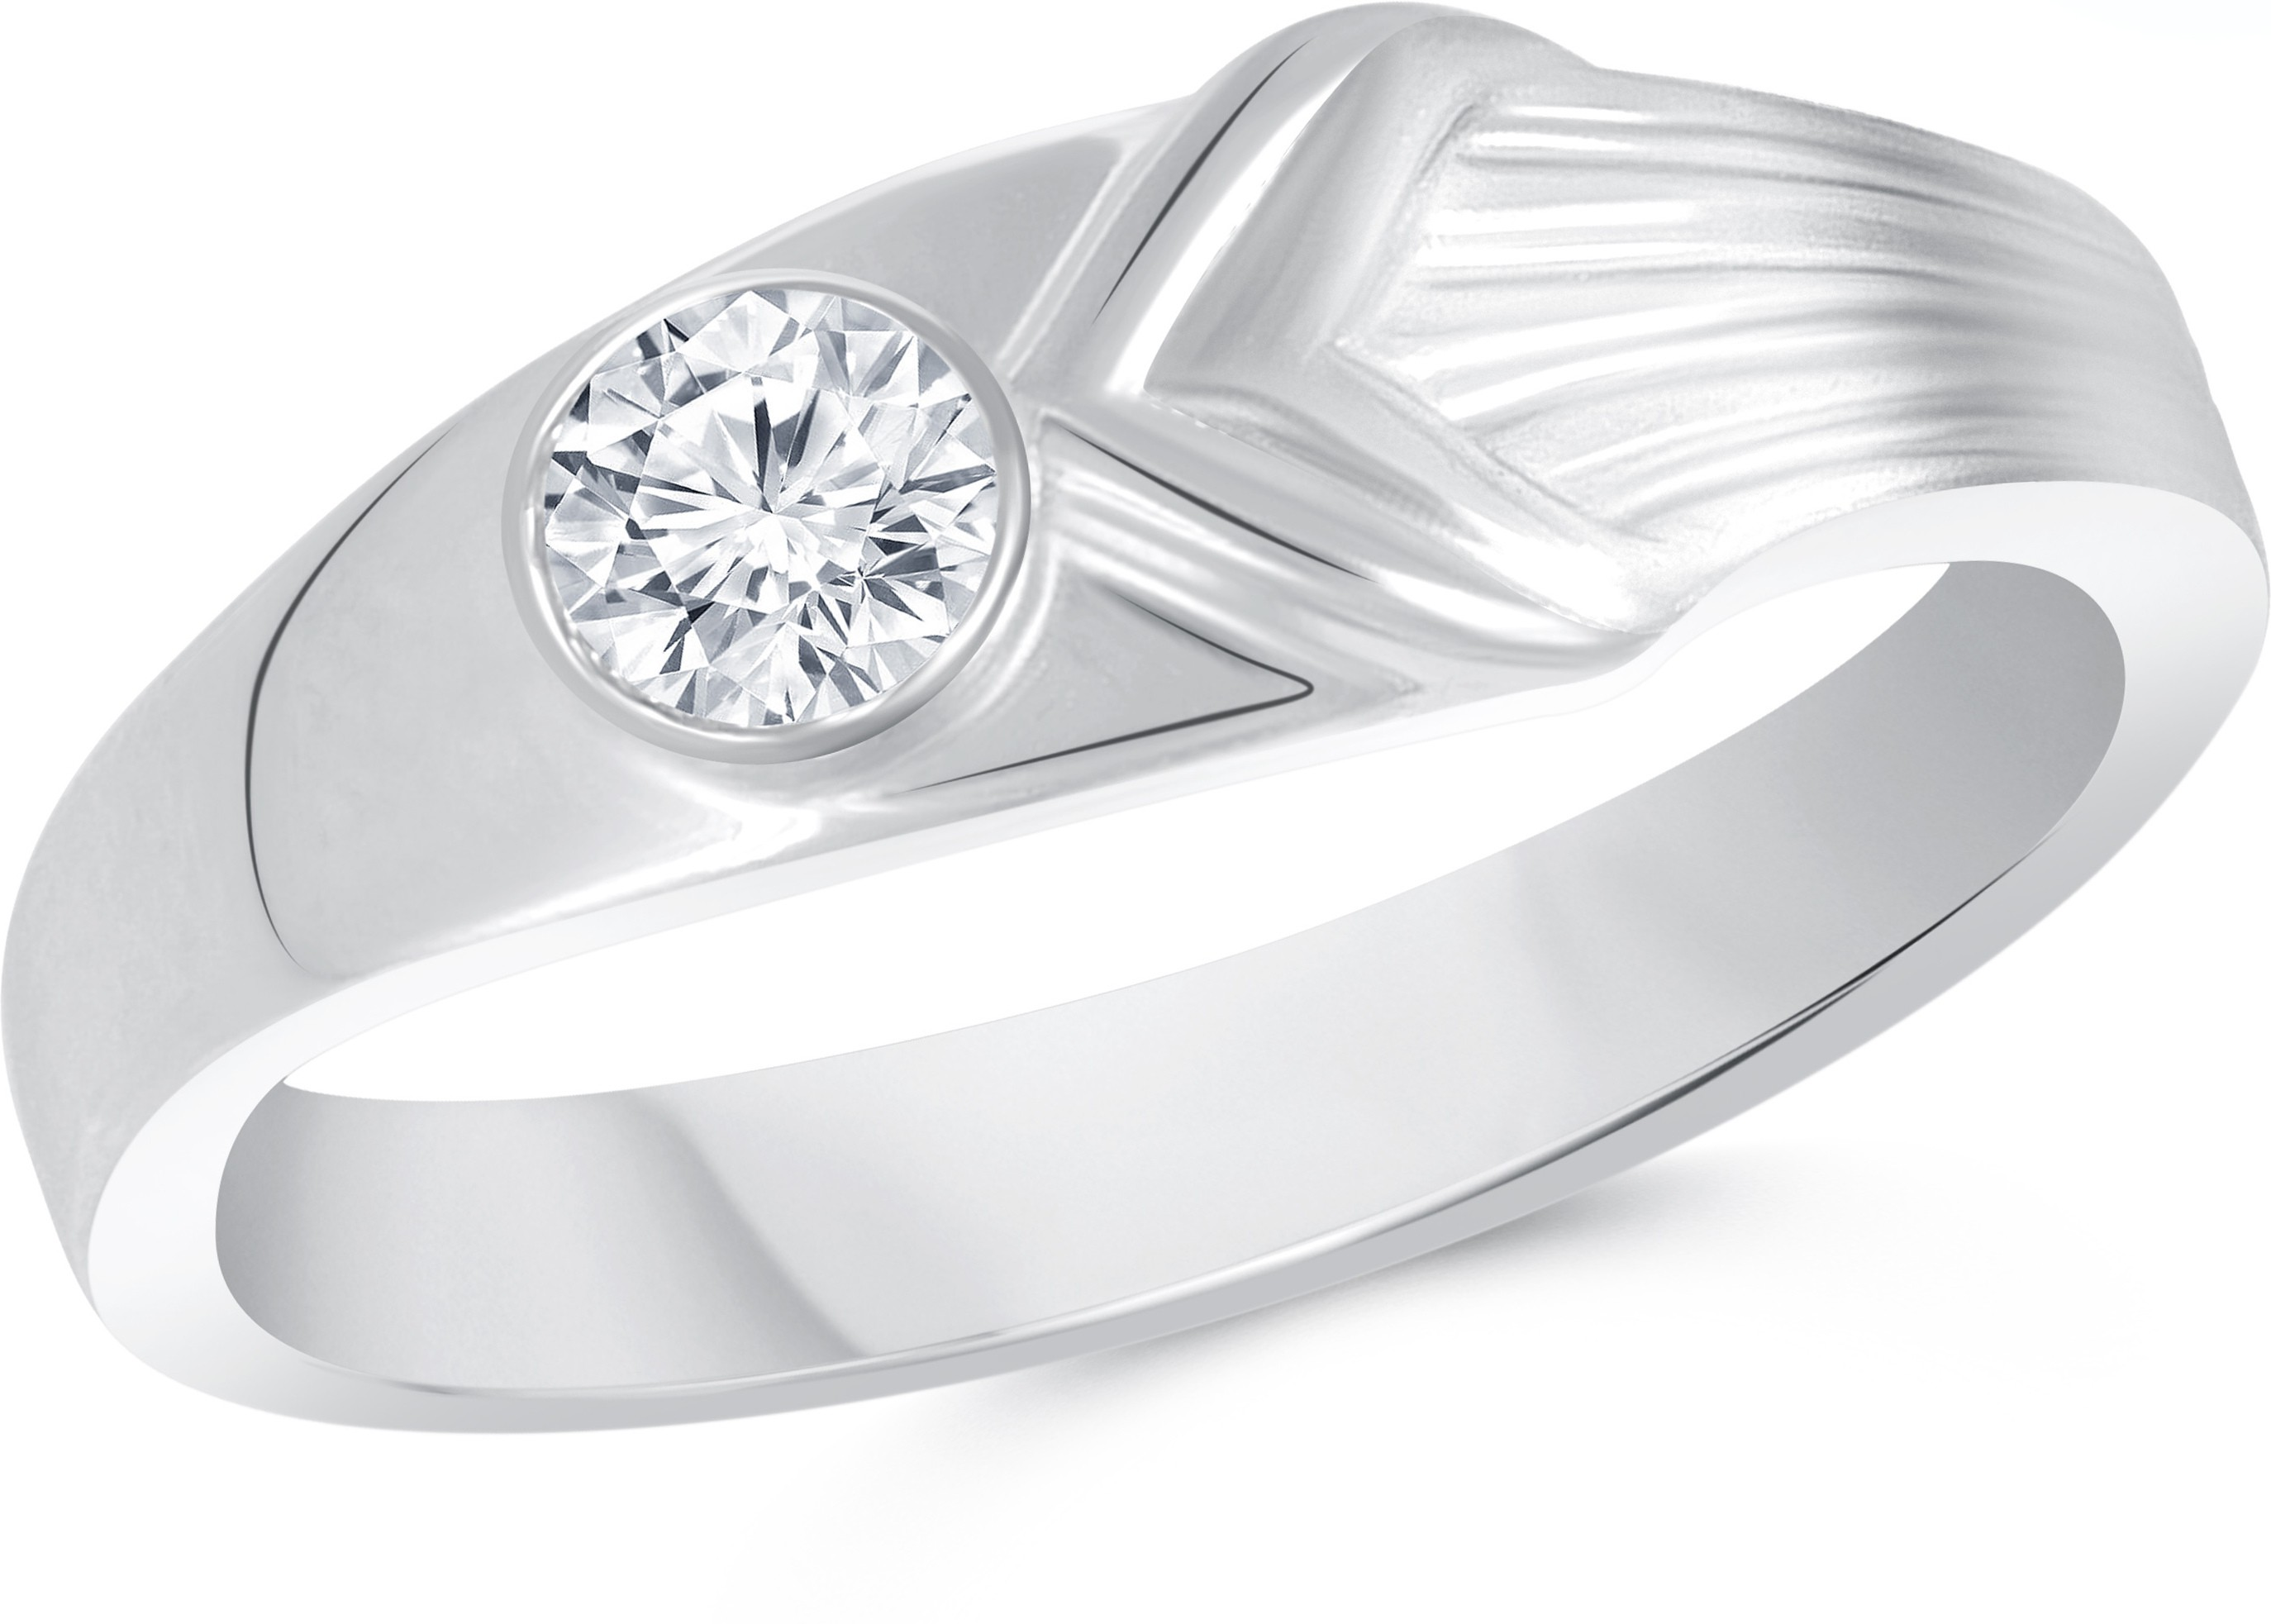 Deals - Delhi - Rings <br> For someone you love<br> Category - jewellery<br> Business - Flipkart.com